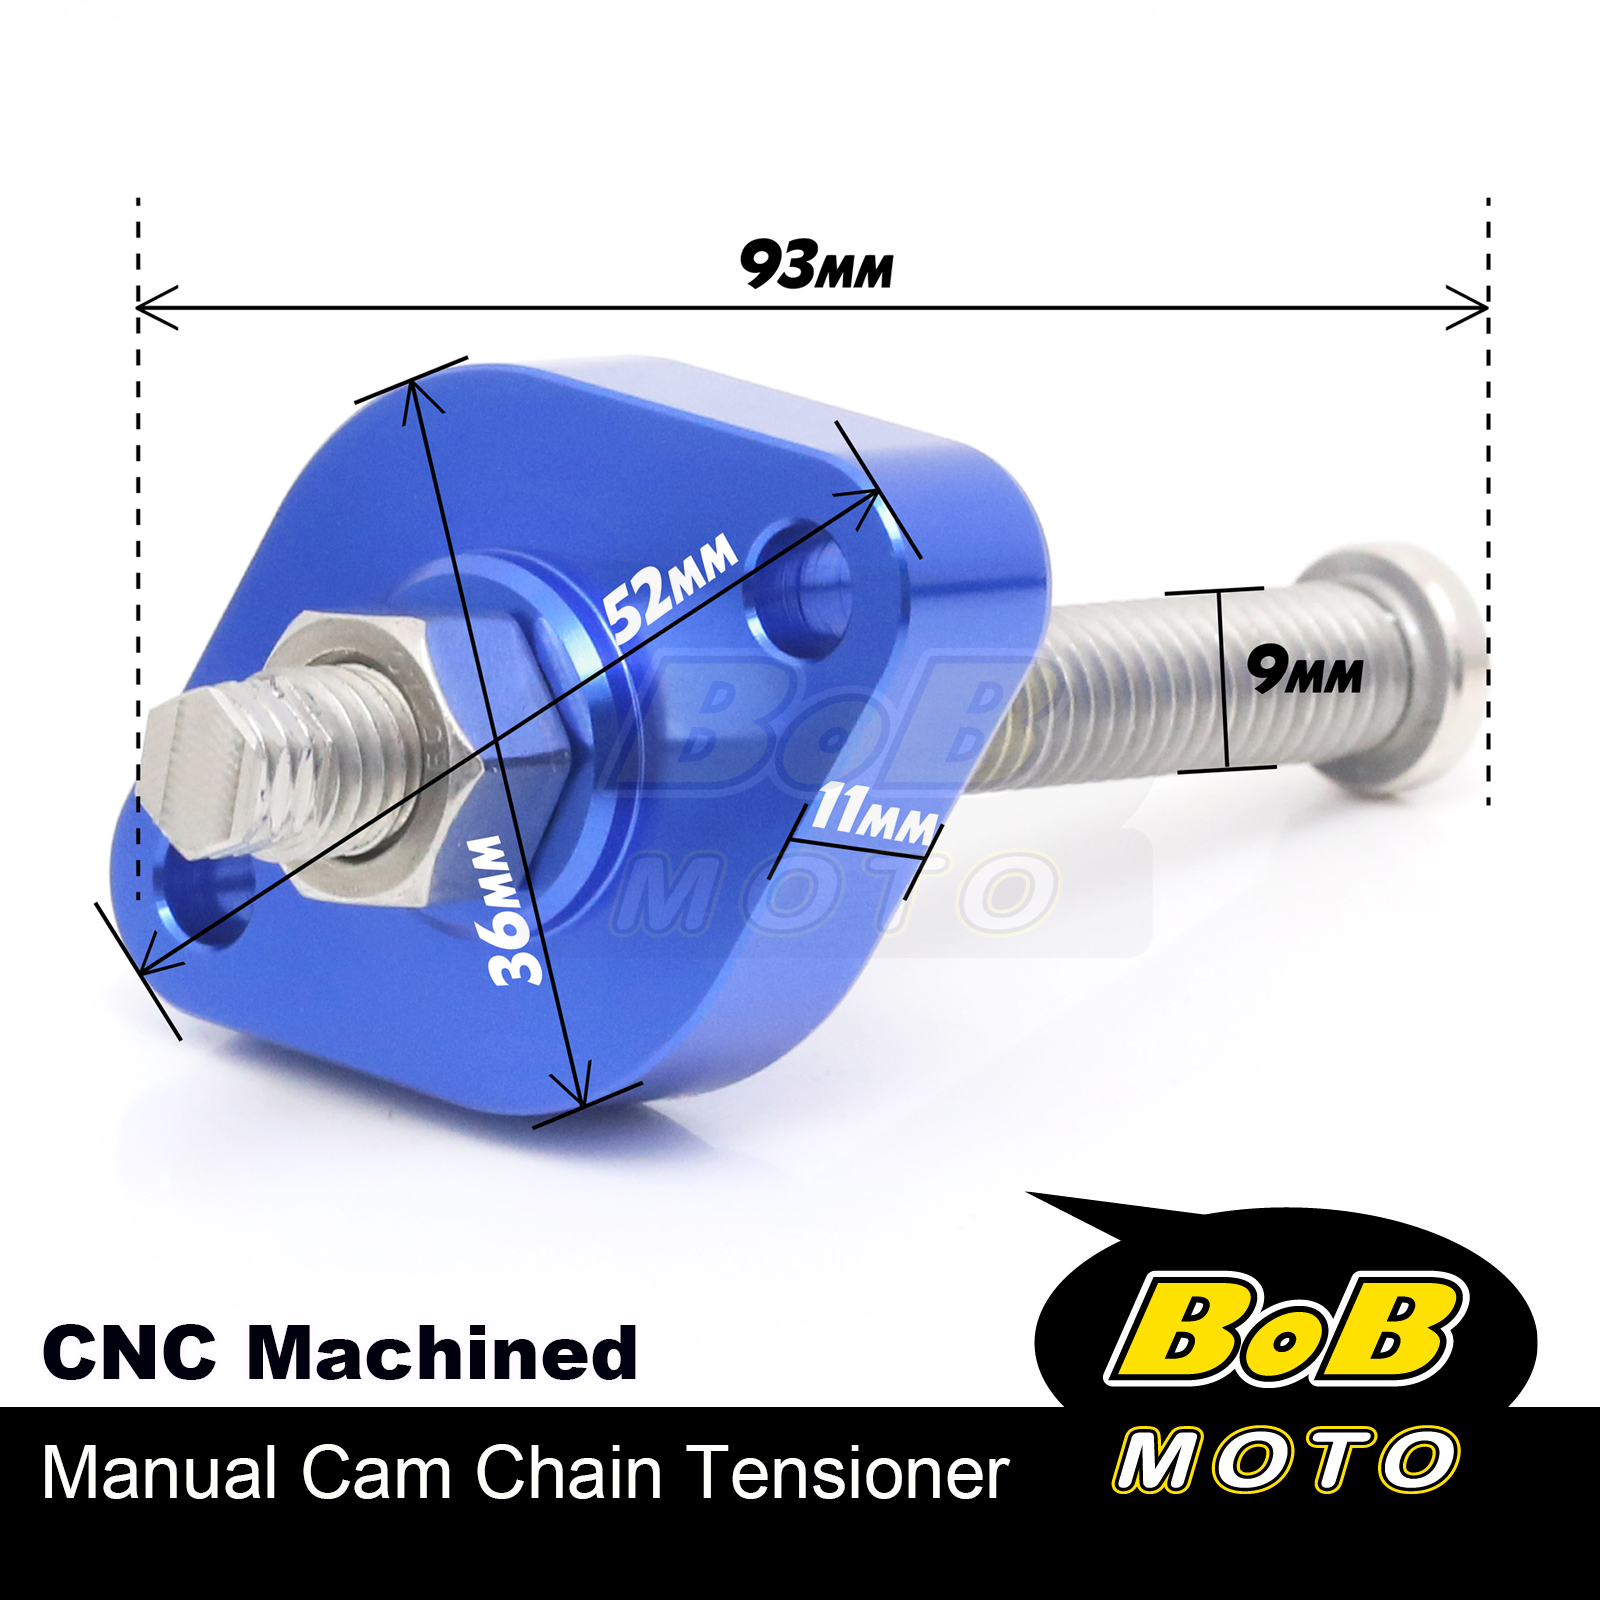 Blue-Precision-HP-Cam-Chain-Tensioner-Fit-YFB250-BEAR-TRACKER-1999-2002 thumbnail 4